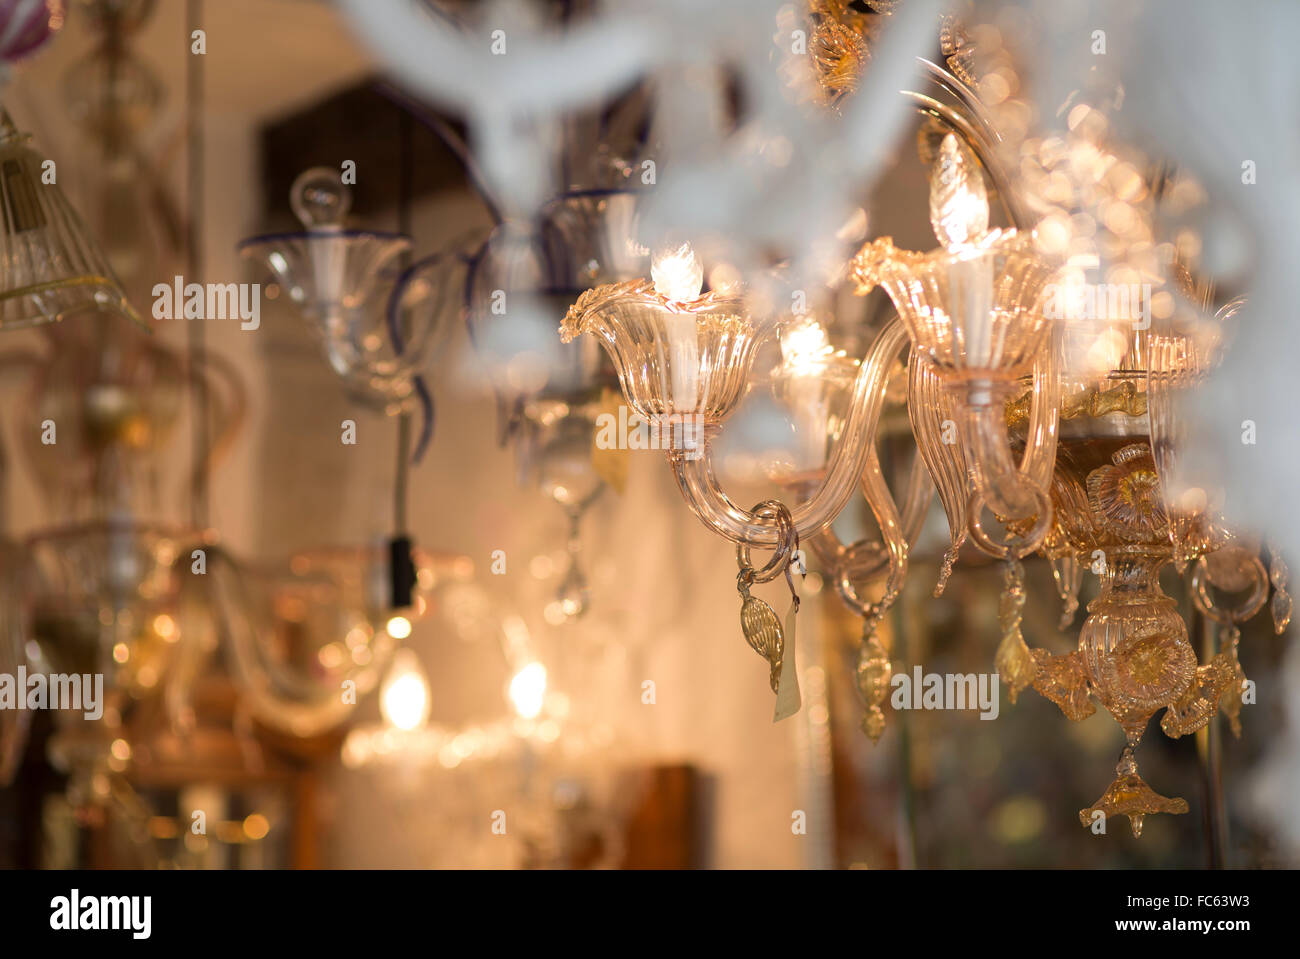 Kronleuchter Aus Murano Glas ~ Kronleuchter in glas shop in murano venedig italien stockfoto